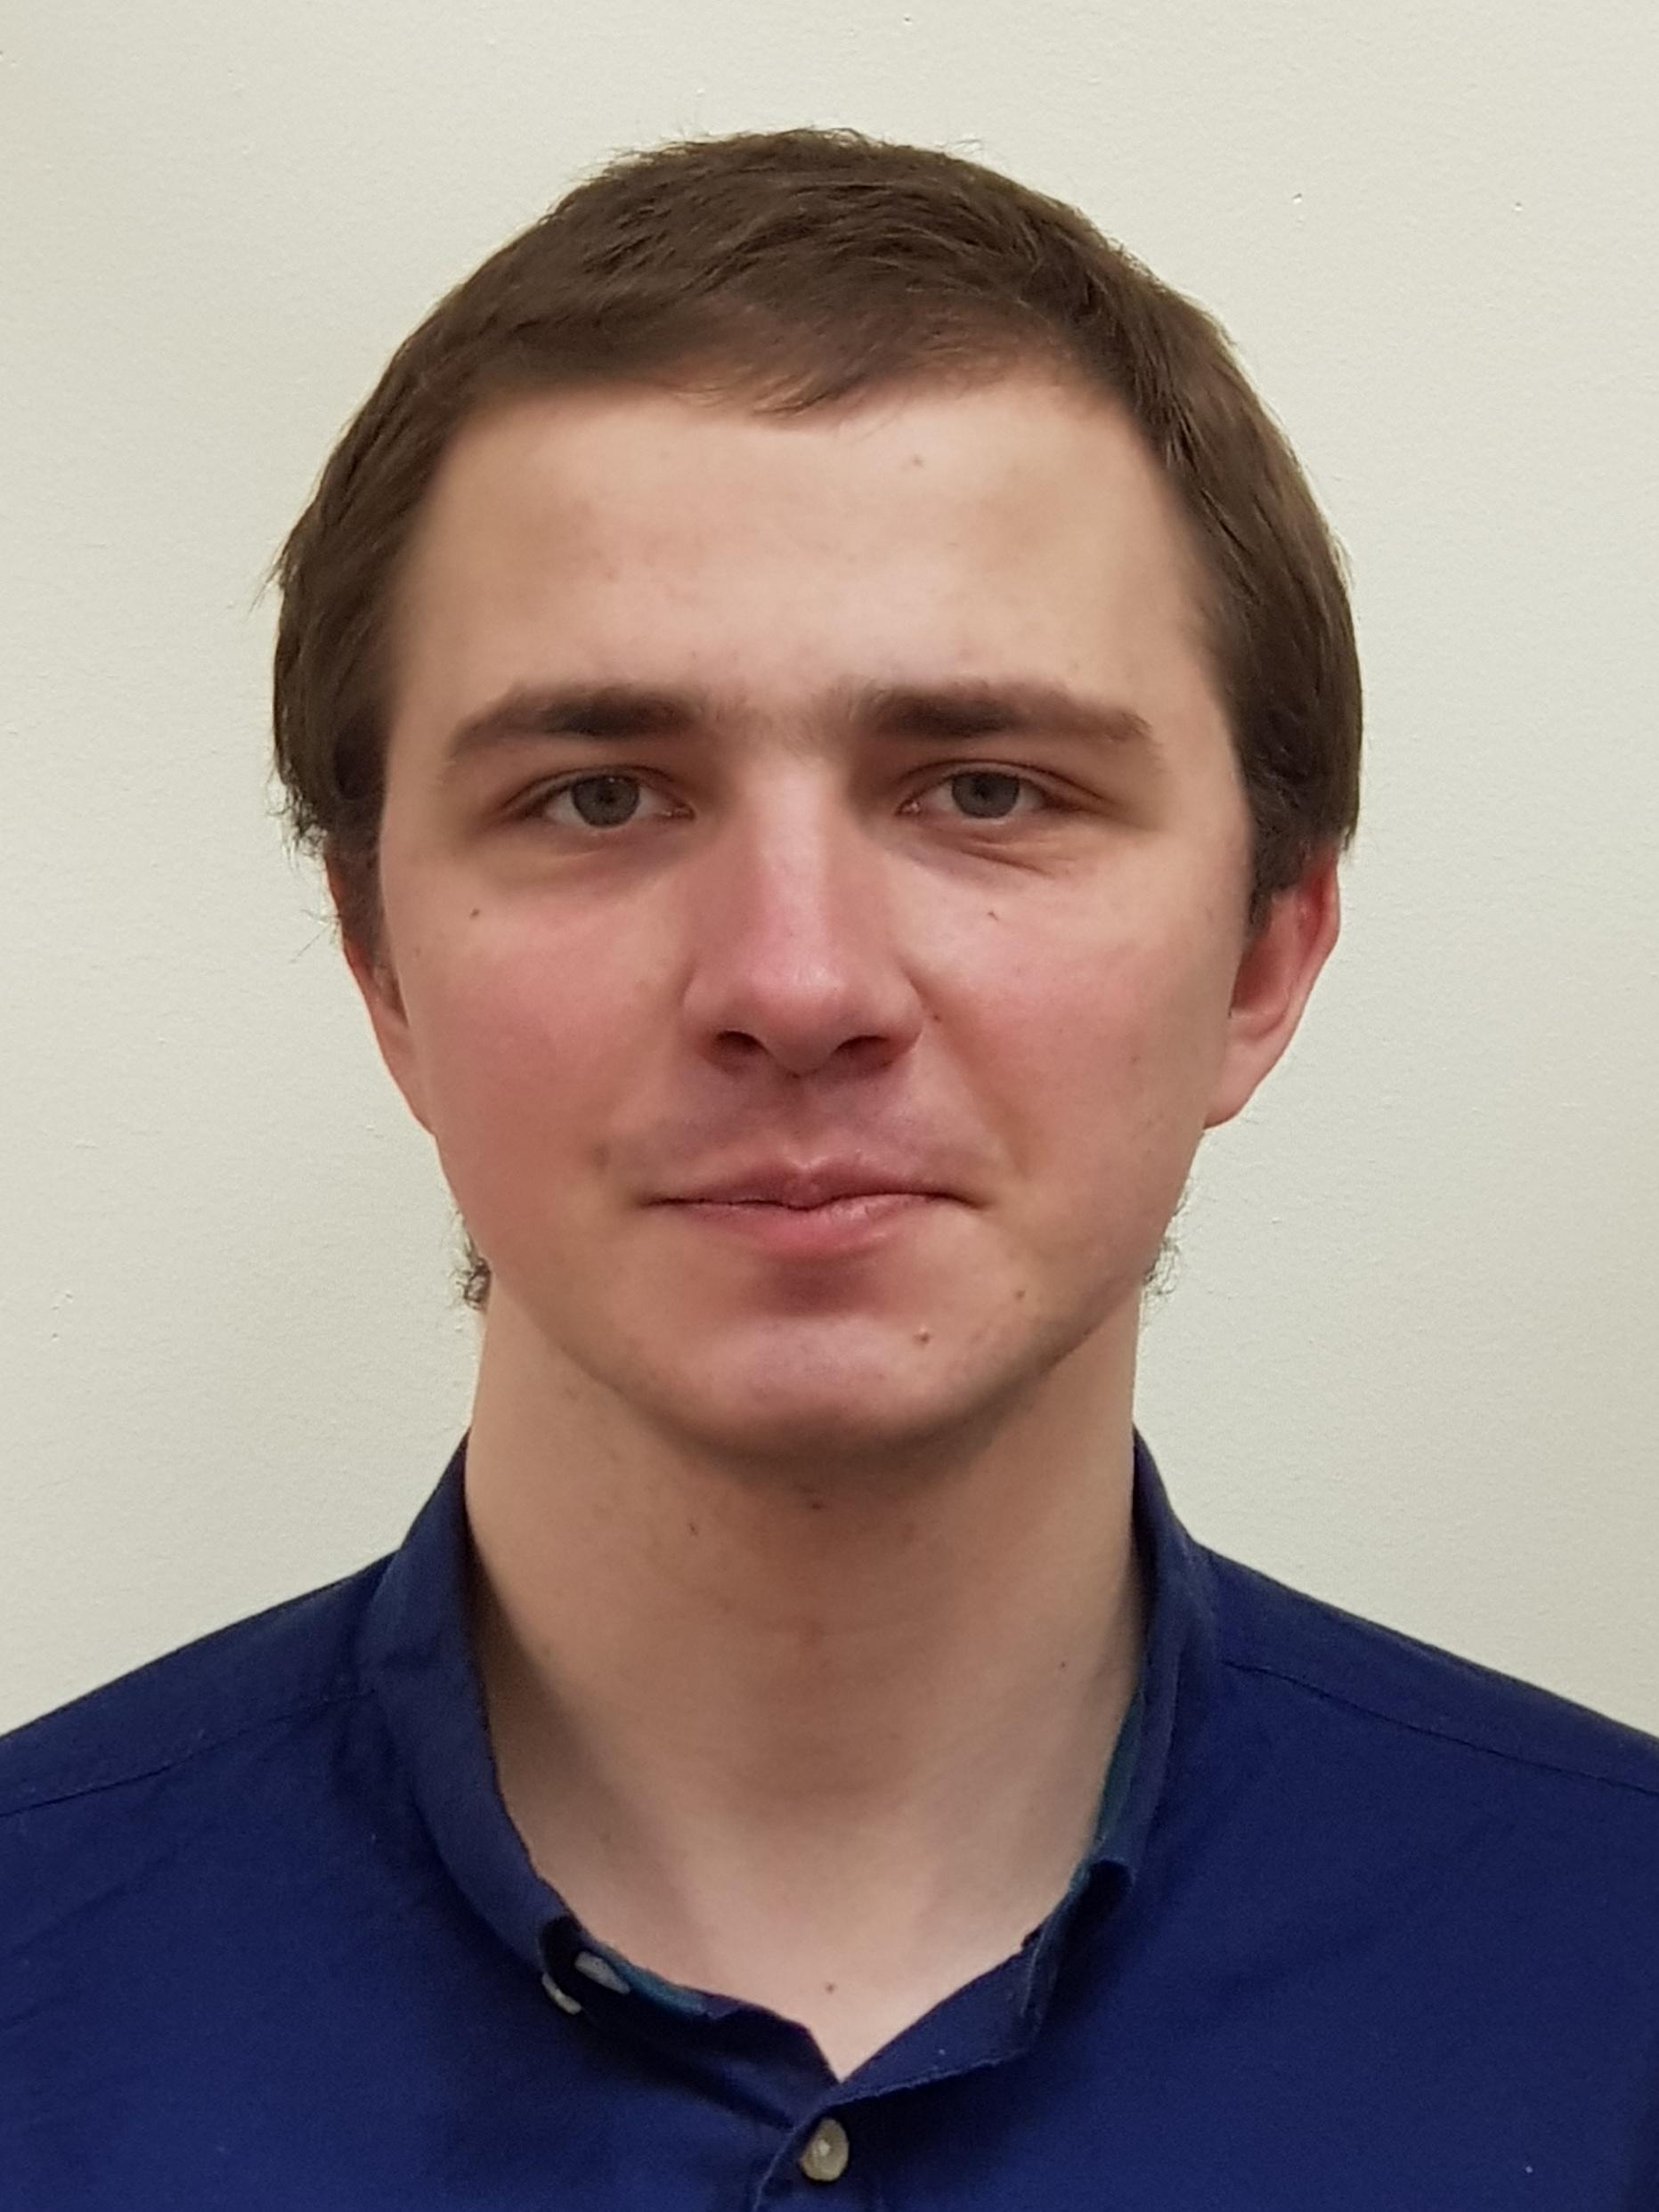 Фомин Владимир Евгеньевич